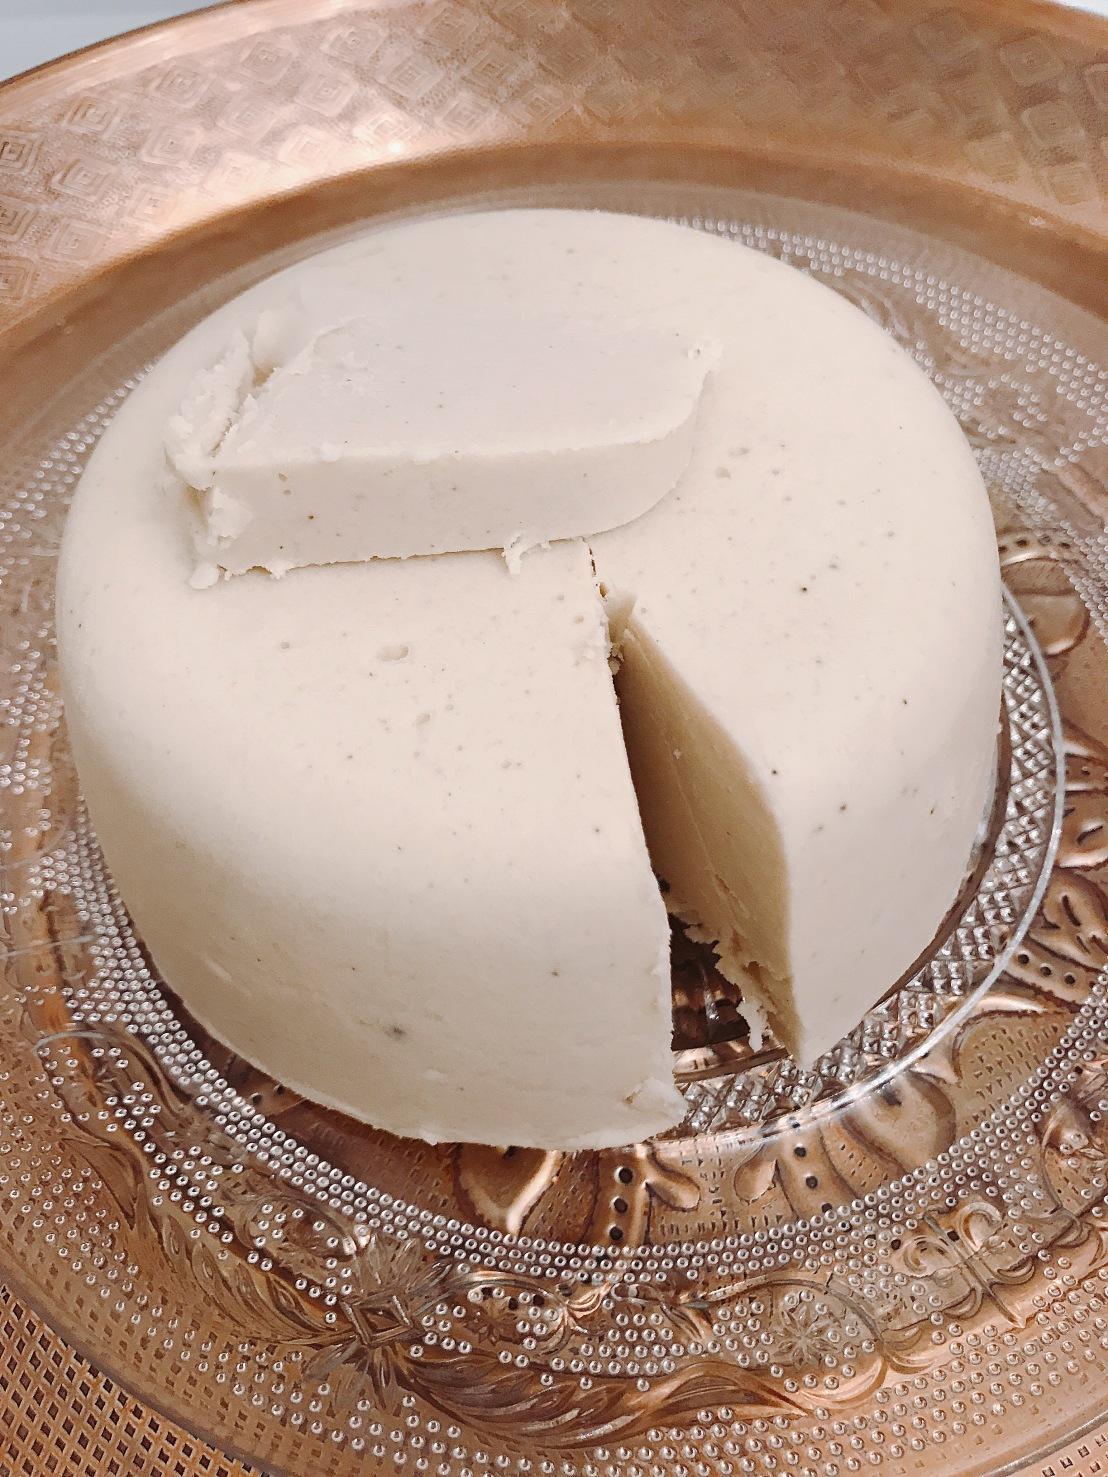 #1 Making vegan cheeses (how to make veganbrie)